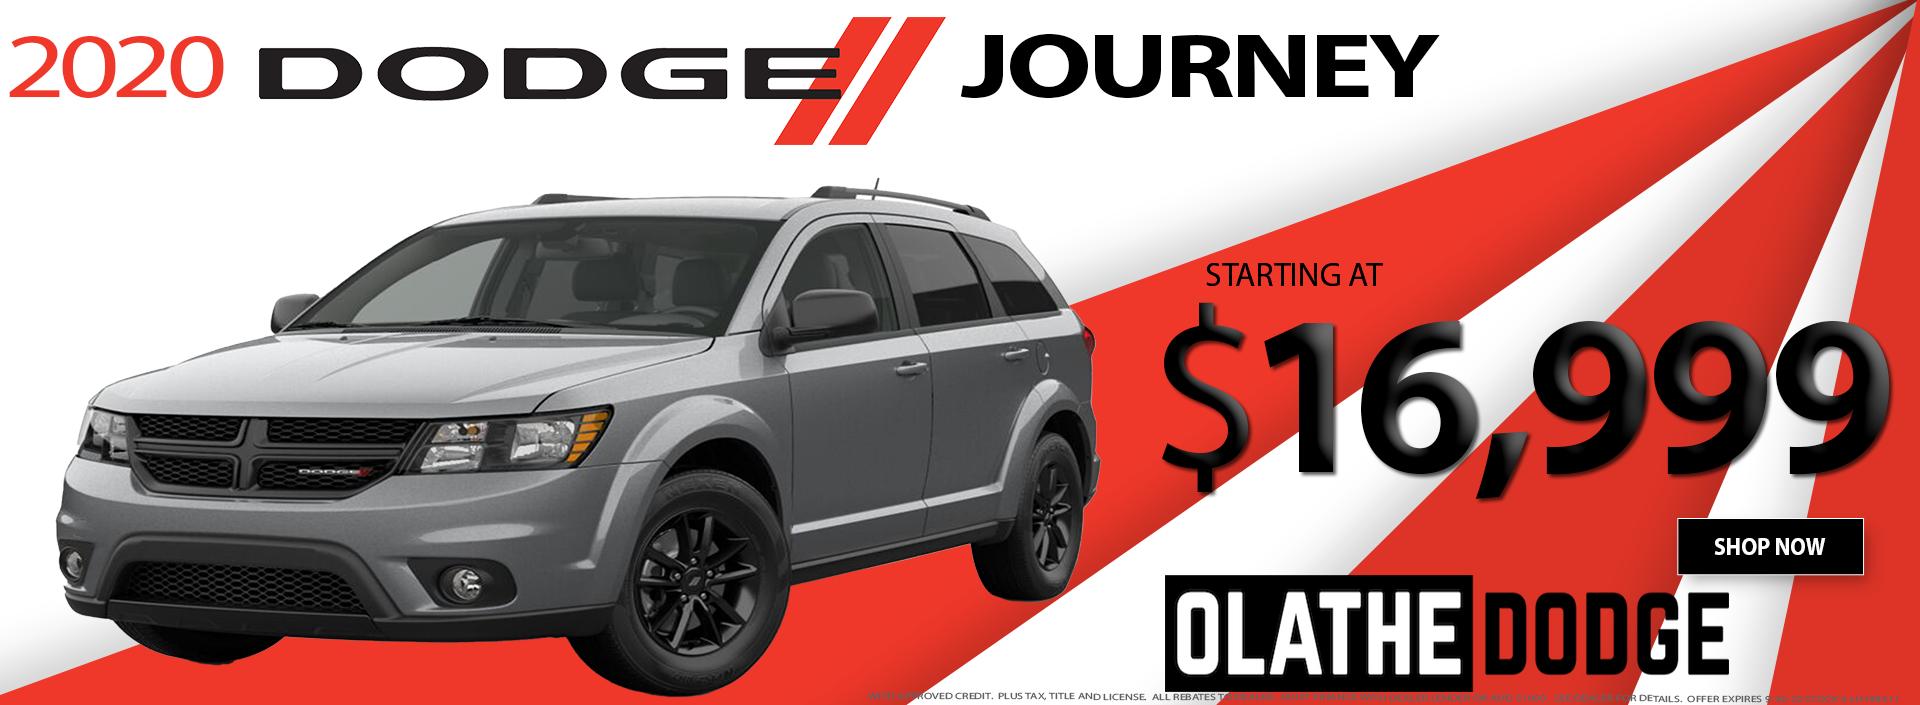 09.04.2020 — Olathe Dodge — 2020 dodge journey 1920×705.png